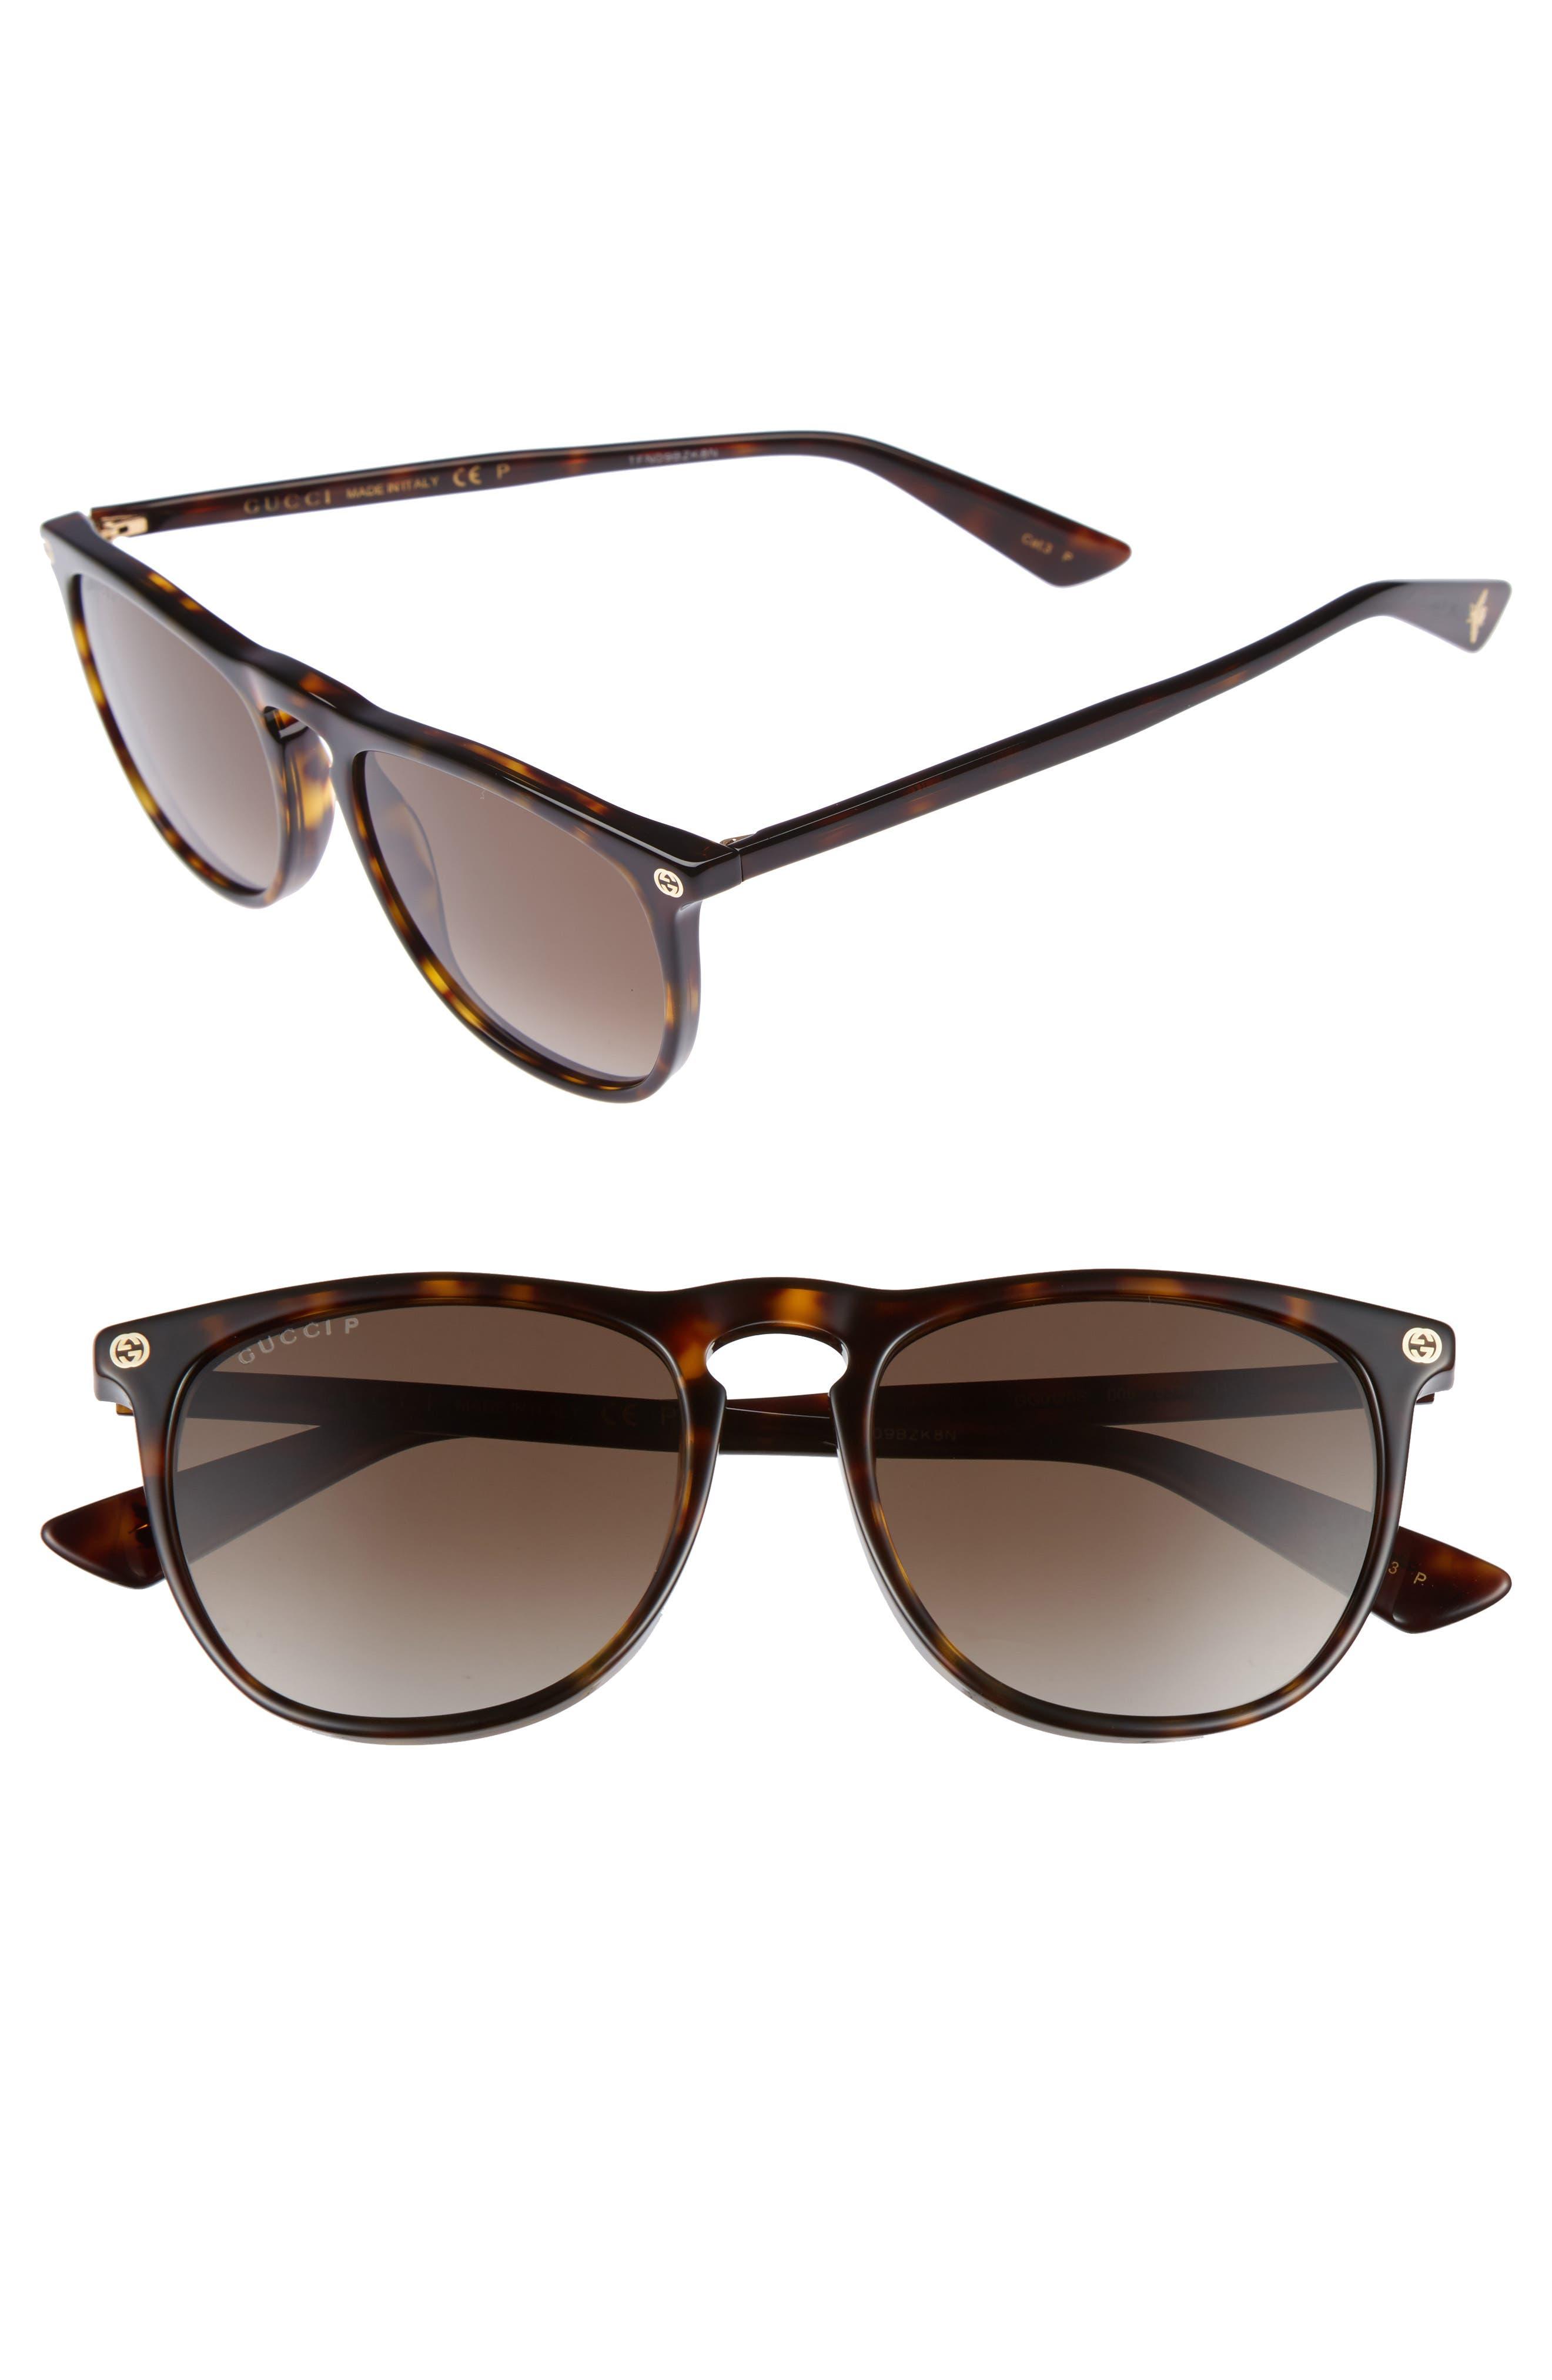 Gucci Pantos 53mm Sunglasses